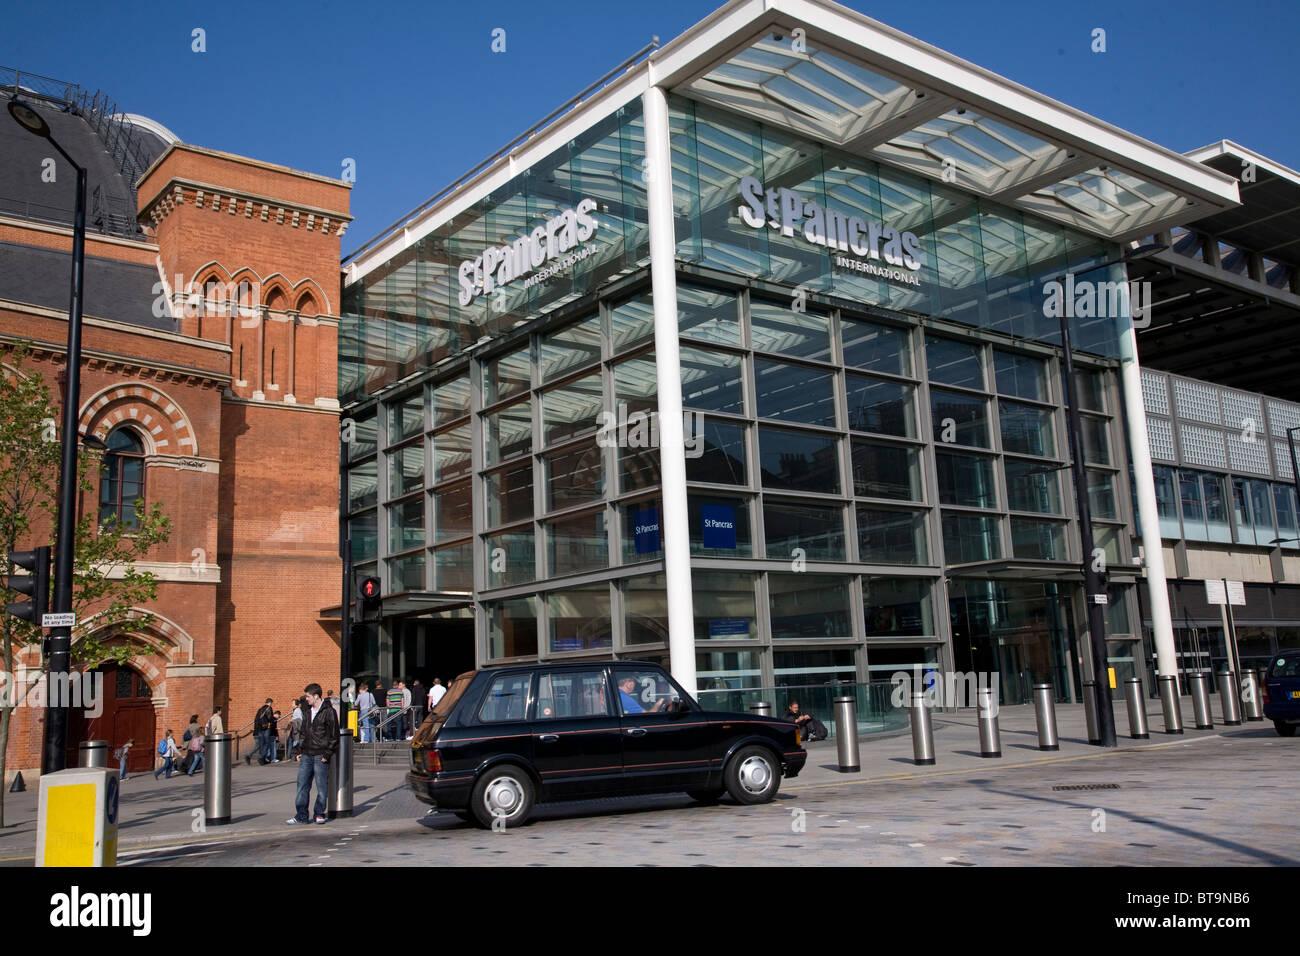 Black taxi cab waiting outside Kings Cross St Pancras station. London. England Stock Photo